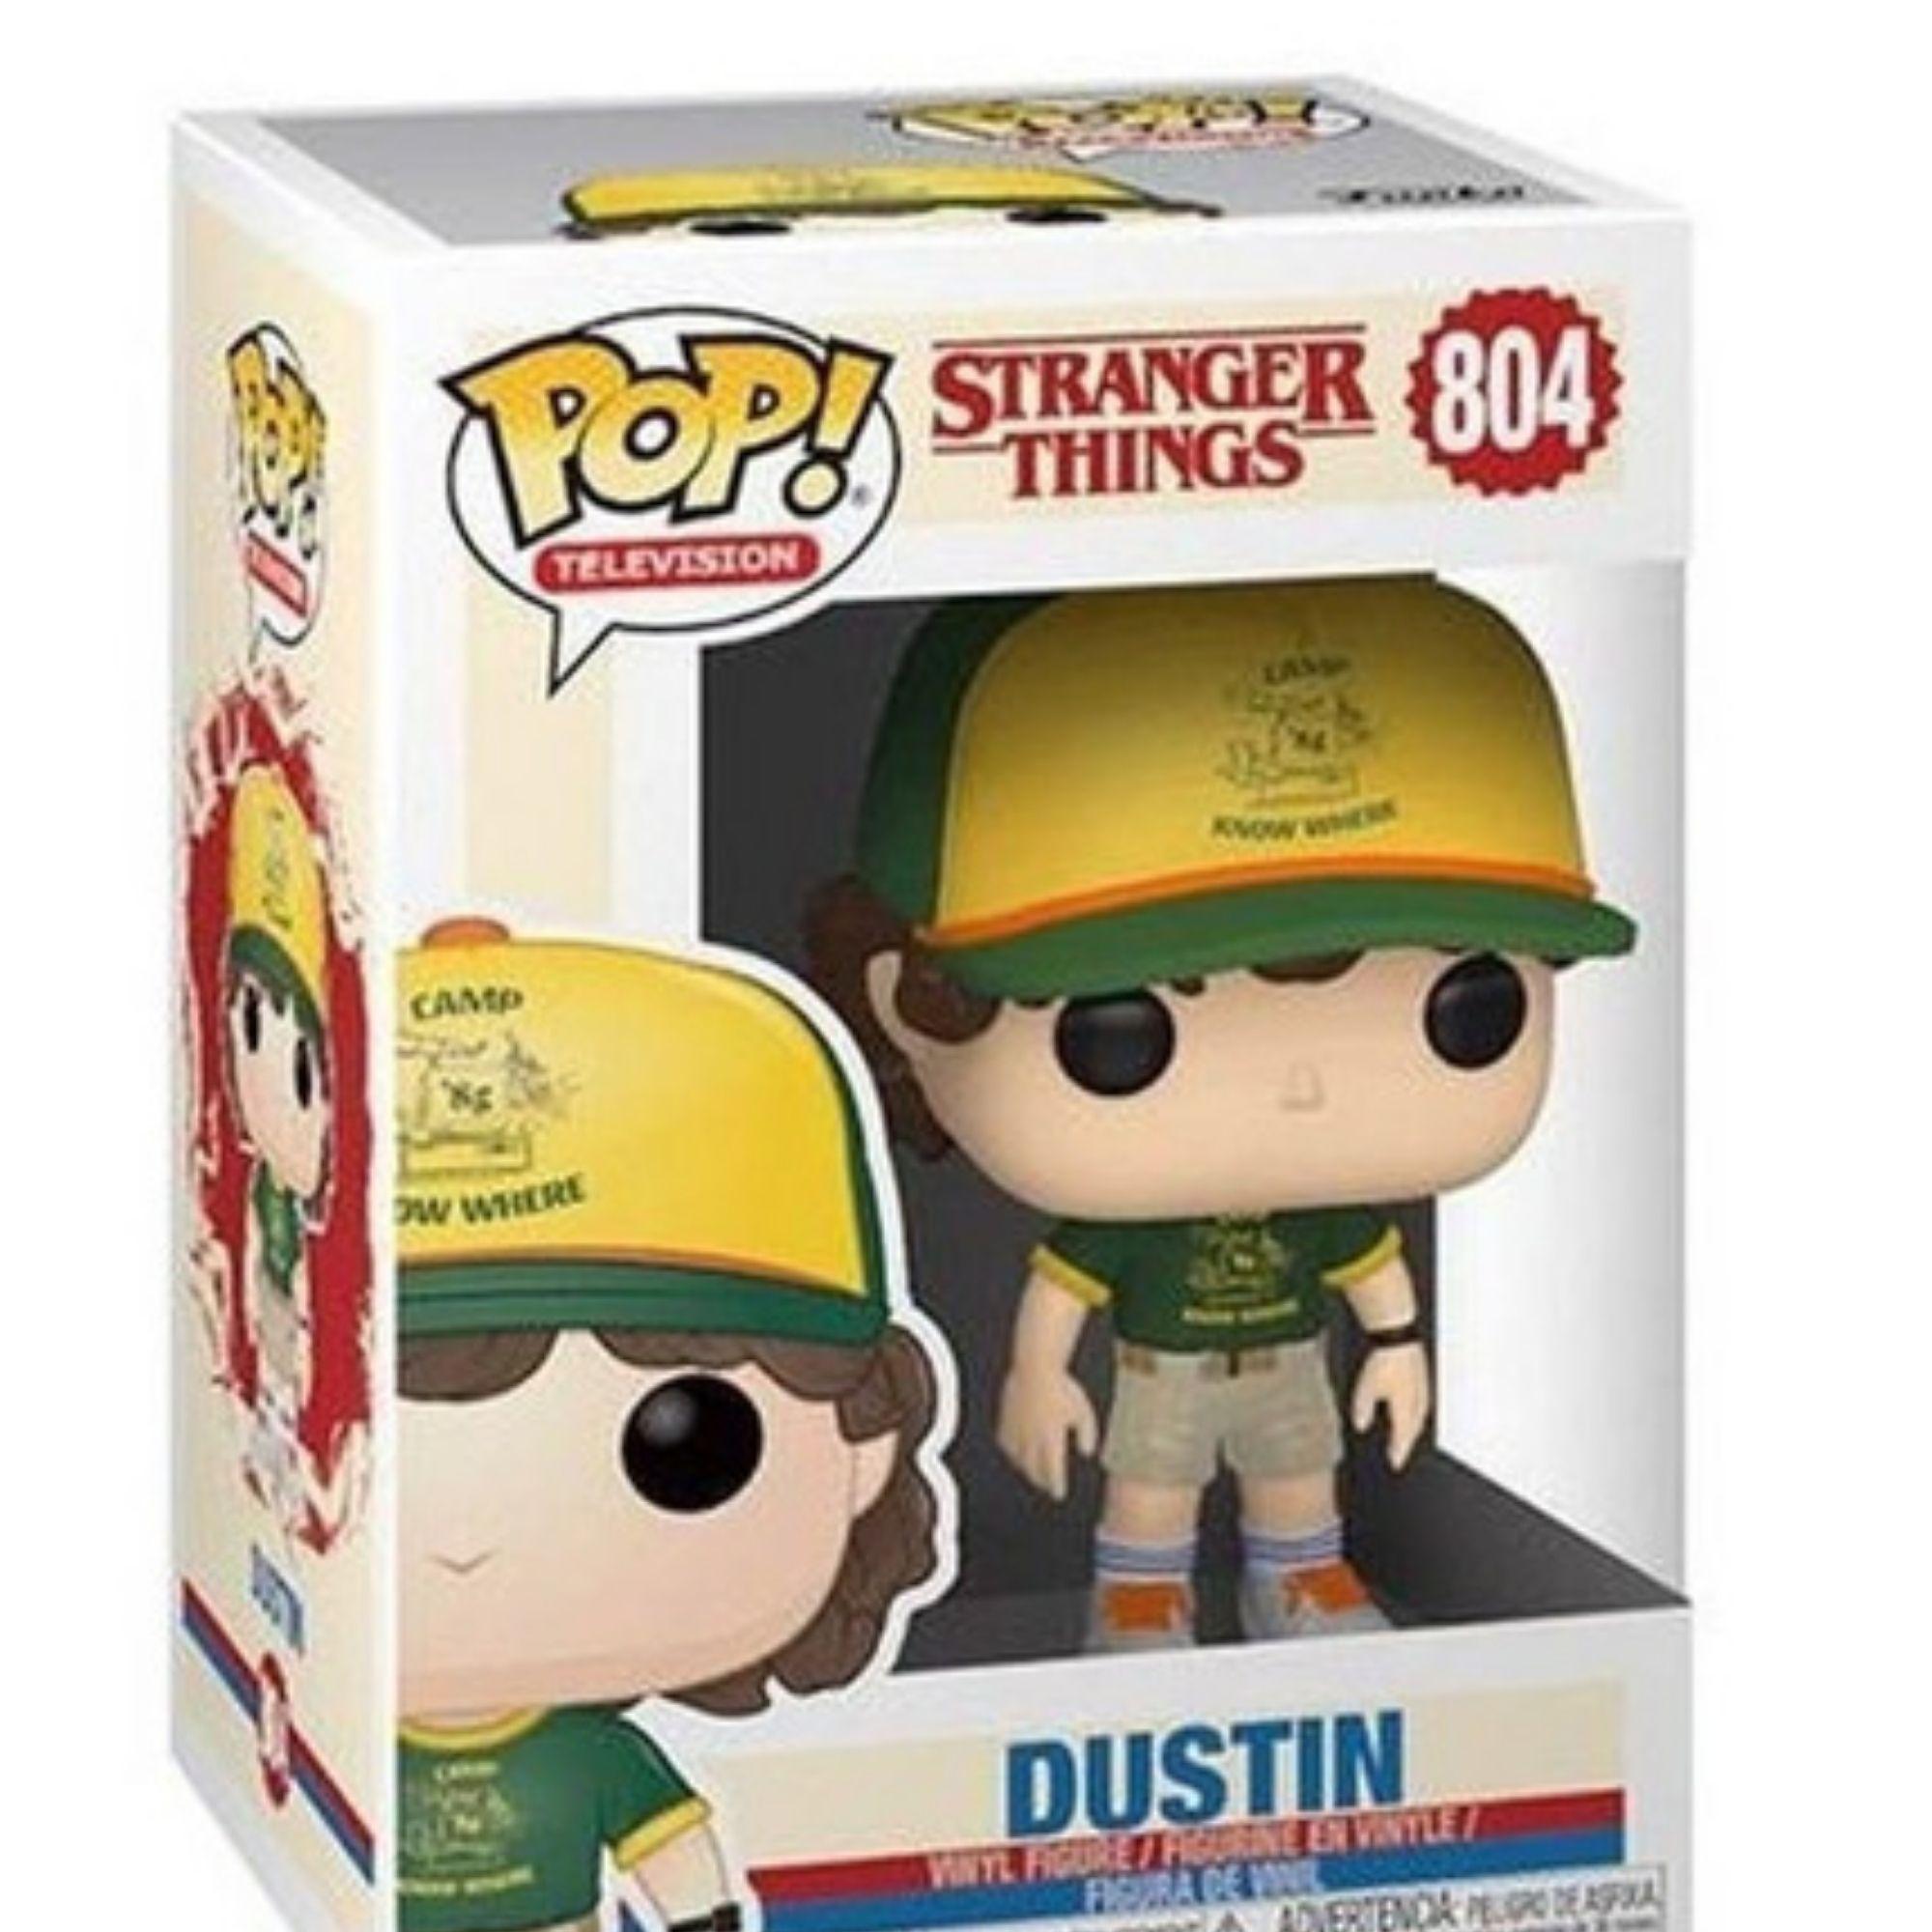 Boneco Funko Pop Stranger Things Dustin #804  - Game Land Brinquedos